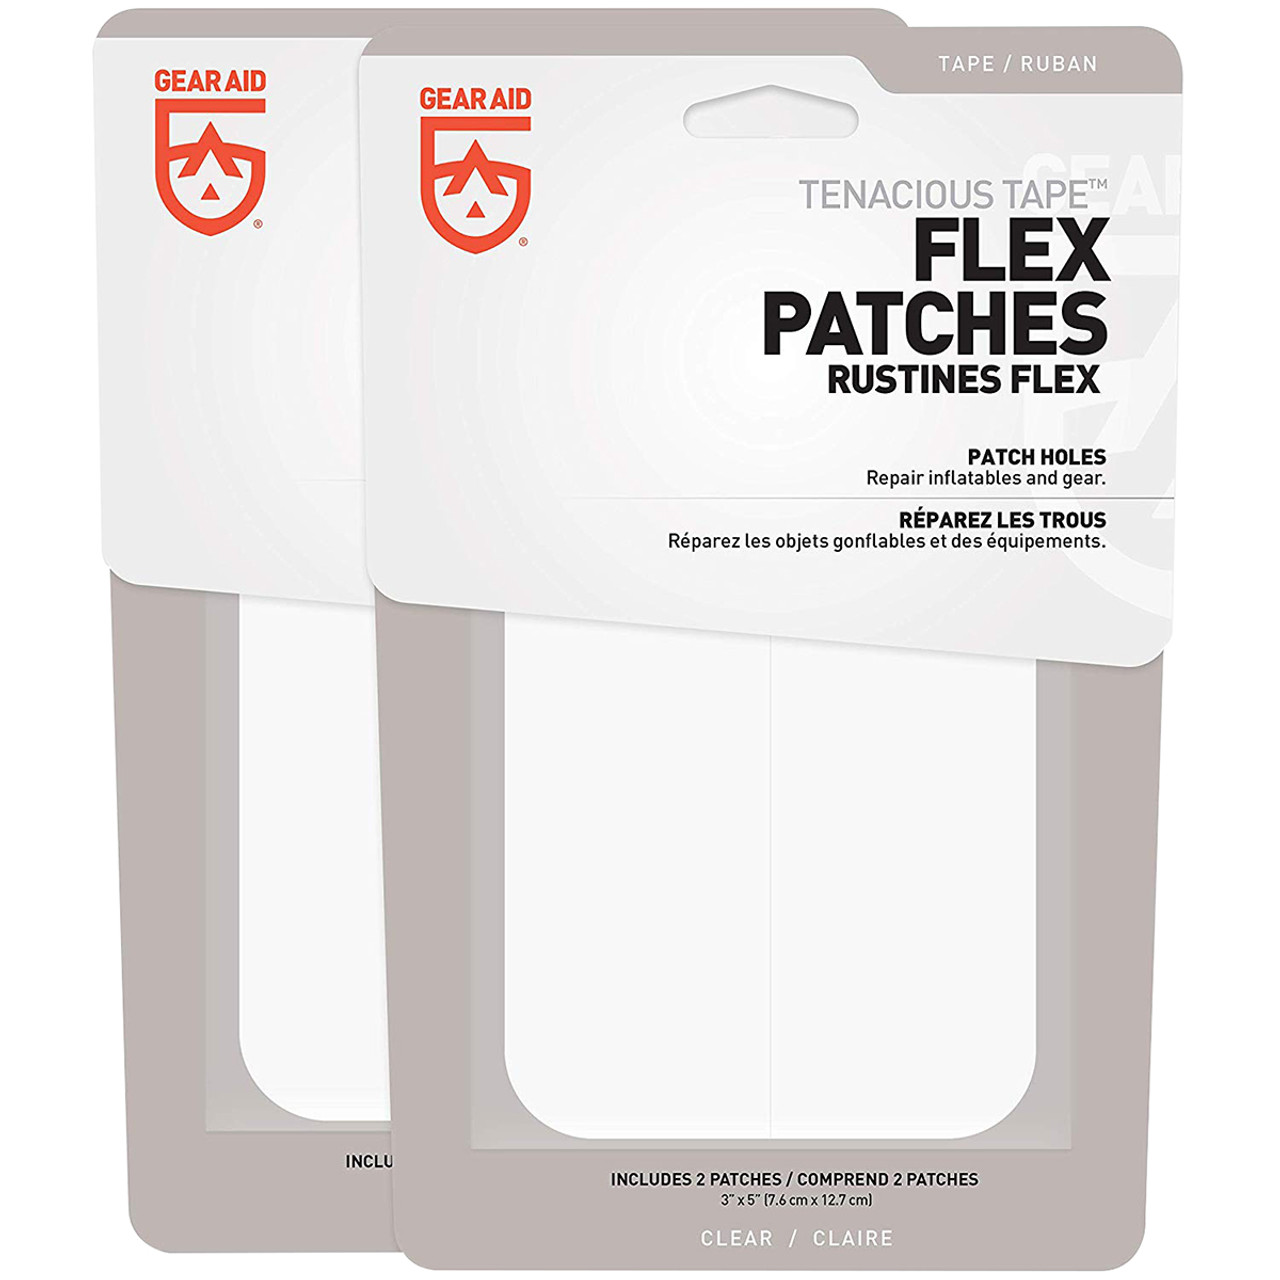 Tenacious Tape Flex Patches 3 x 5